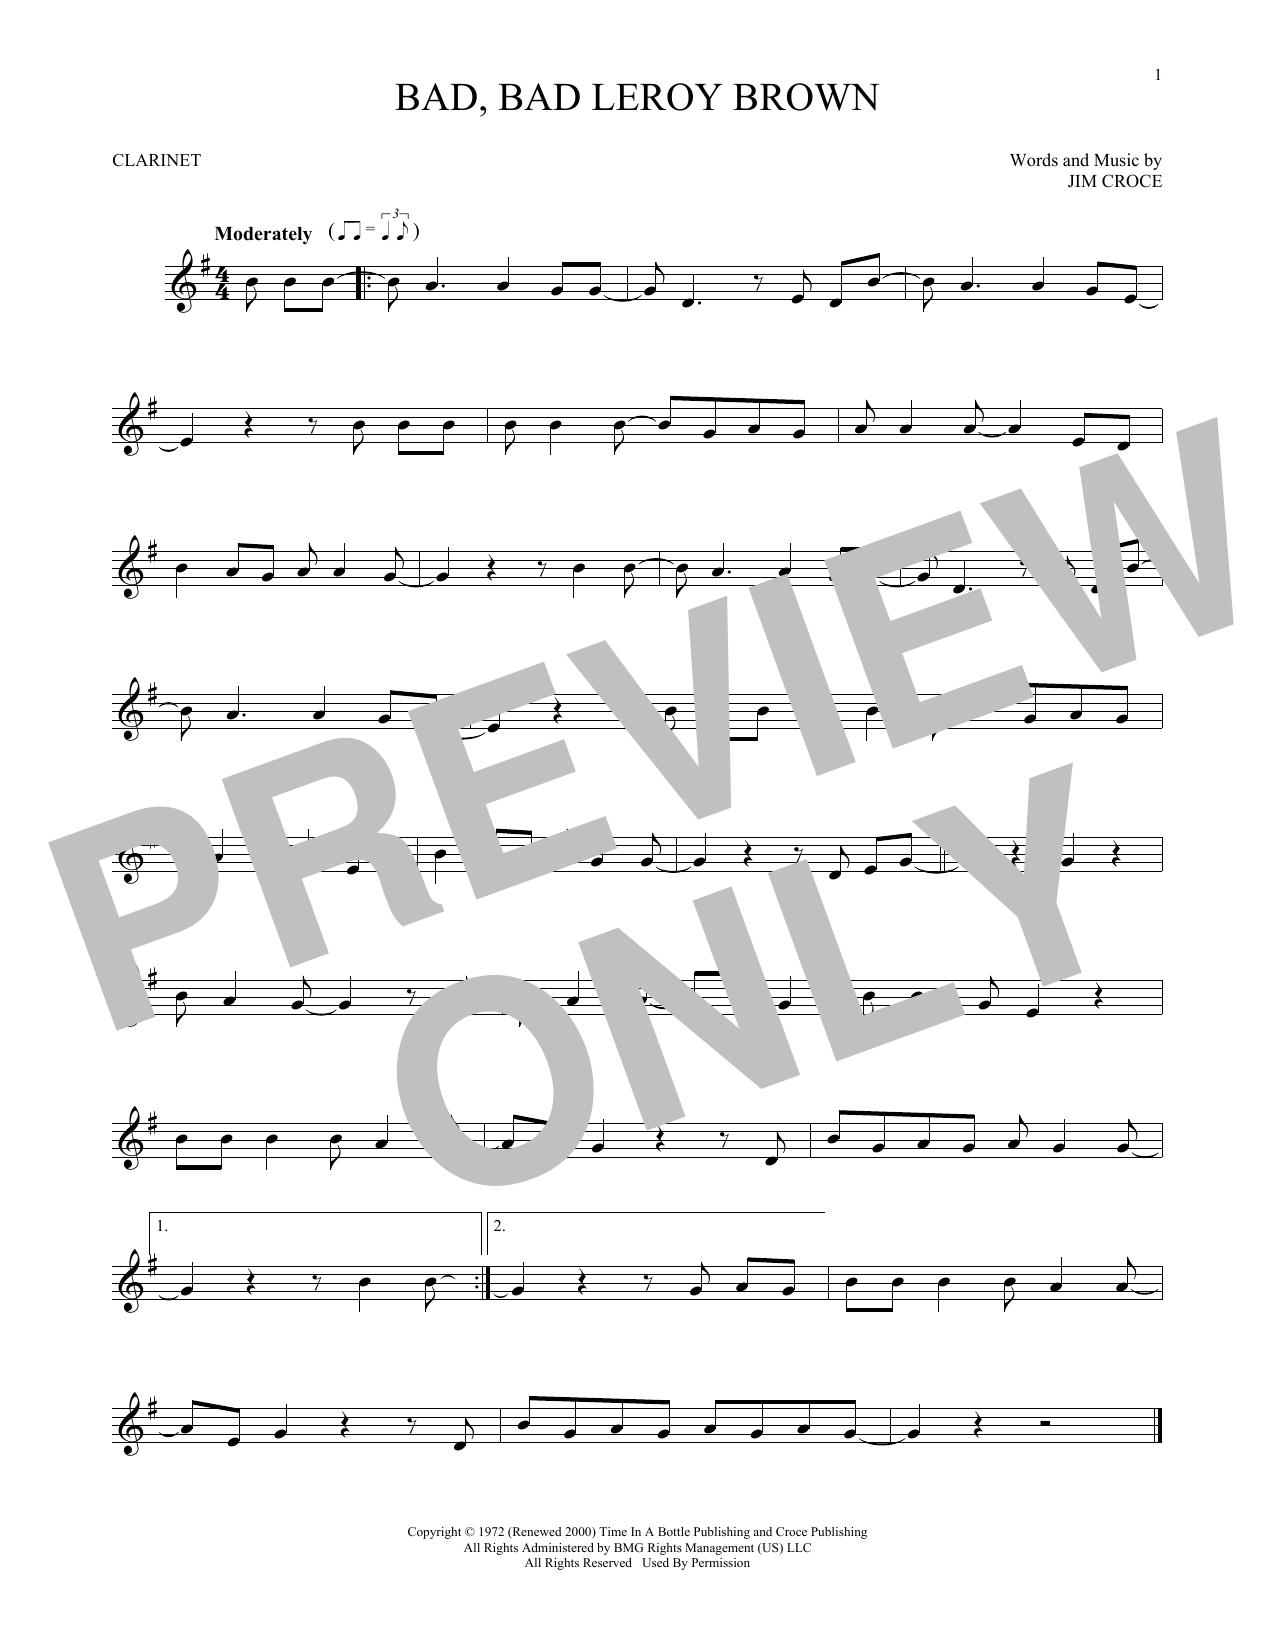 Bad, Bad Leroy Brown (Clarinet Solo)